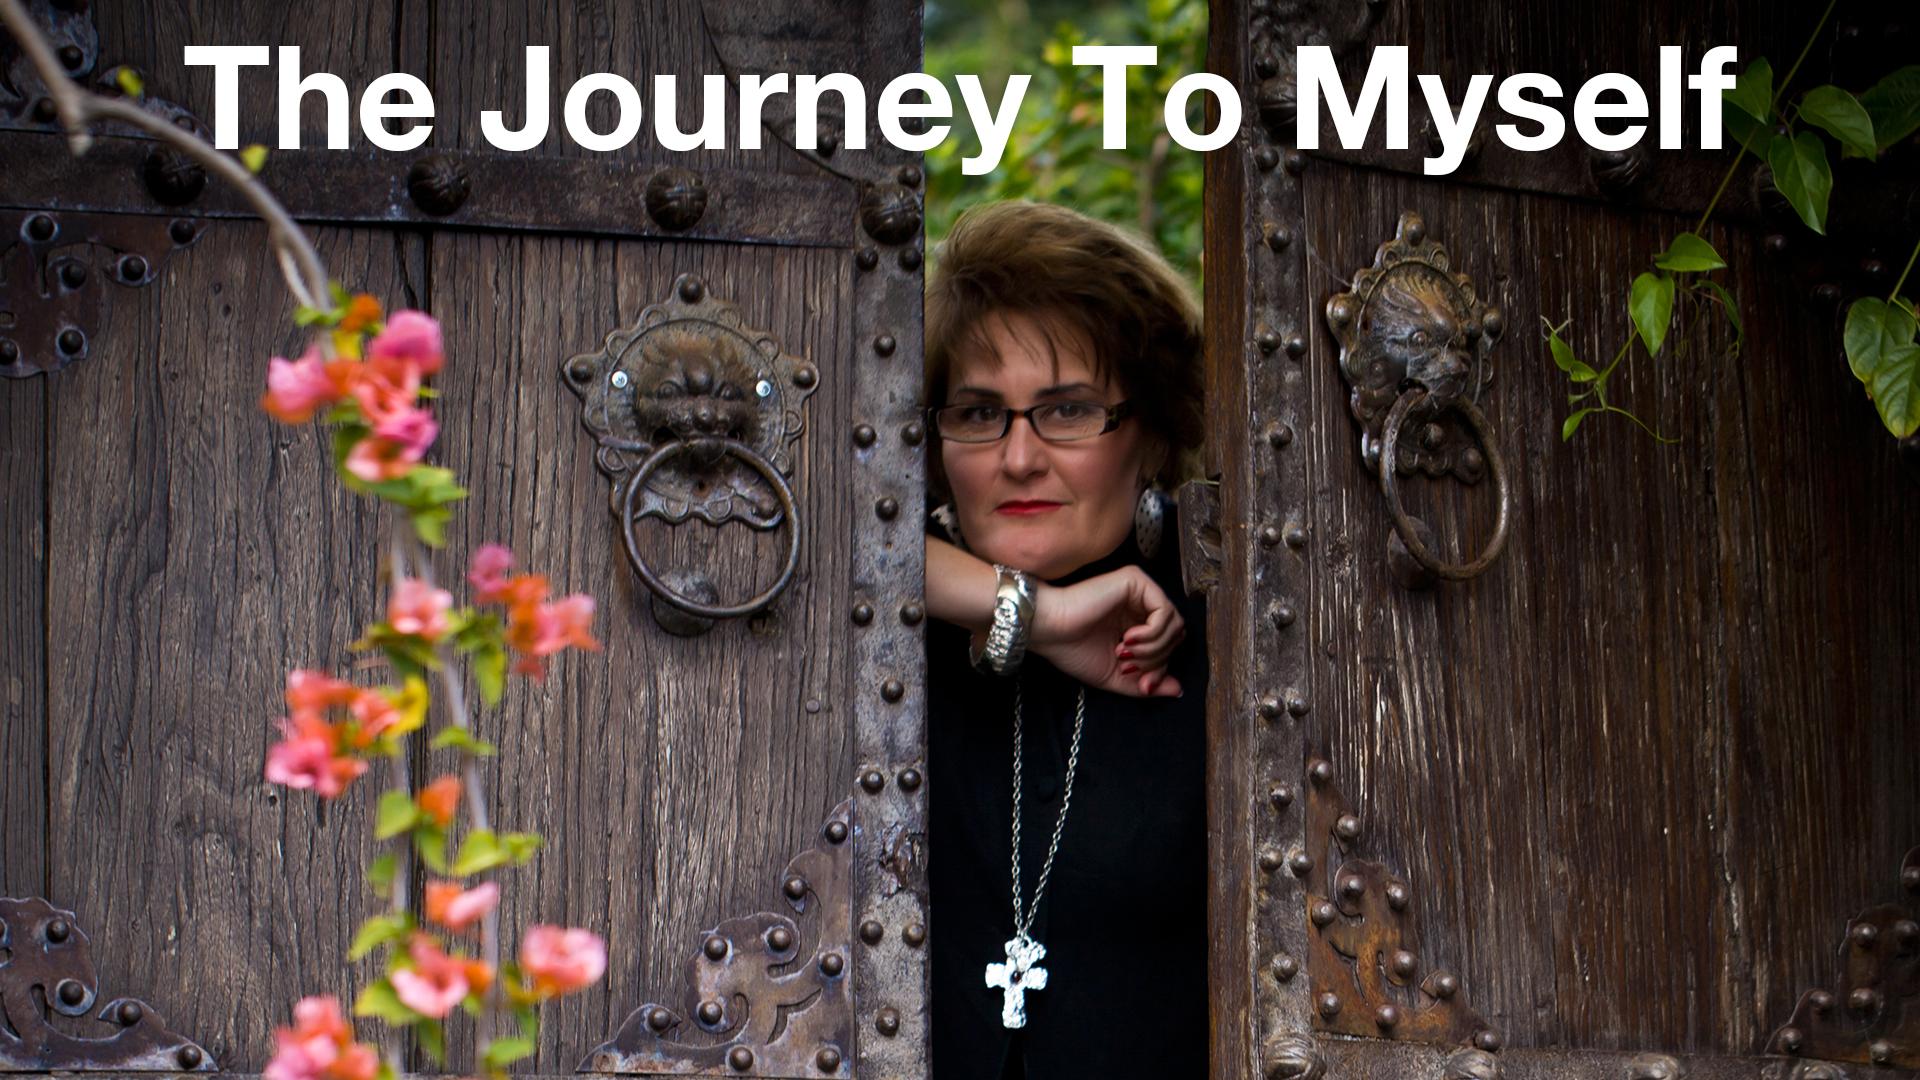 The Journey to Myself